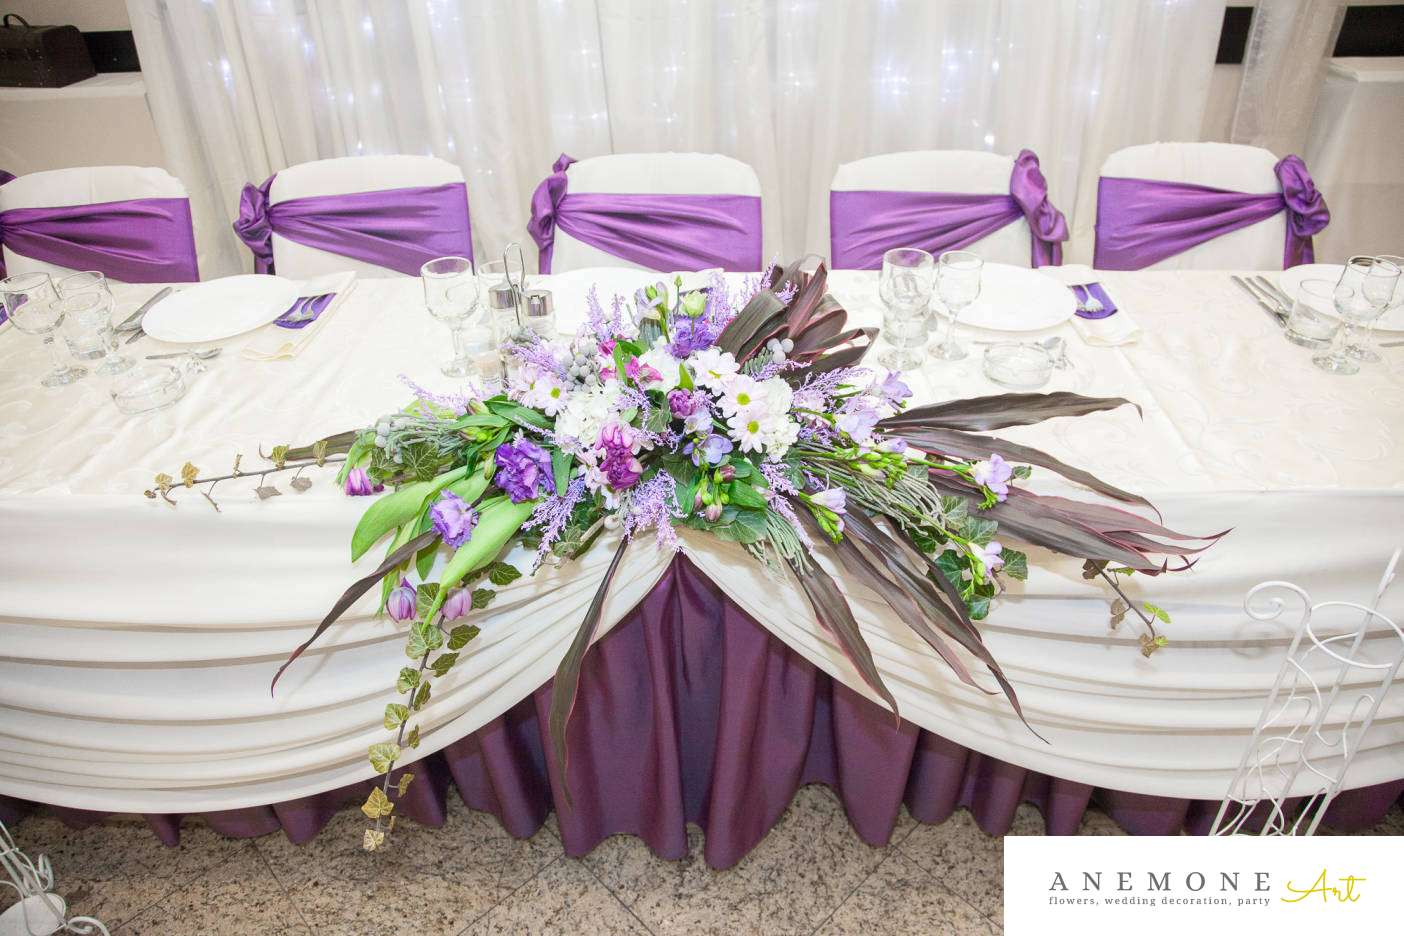 Poza, foto cu Flori de nunta mov, prezidiu in Arad, Timisoara, Oradea (wedding flowers, bouquets) nunta Arad, Timisoara, Oradea